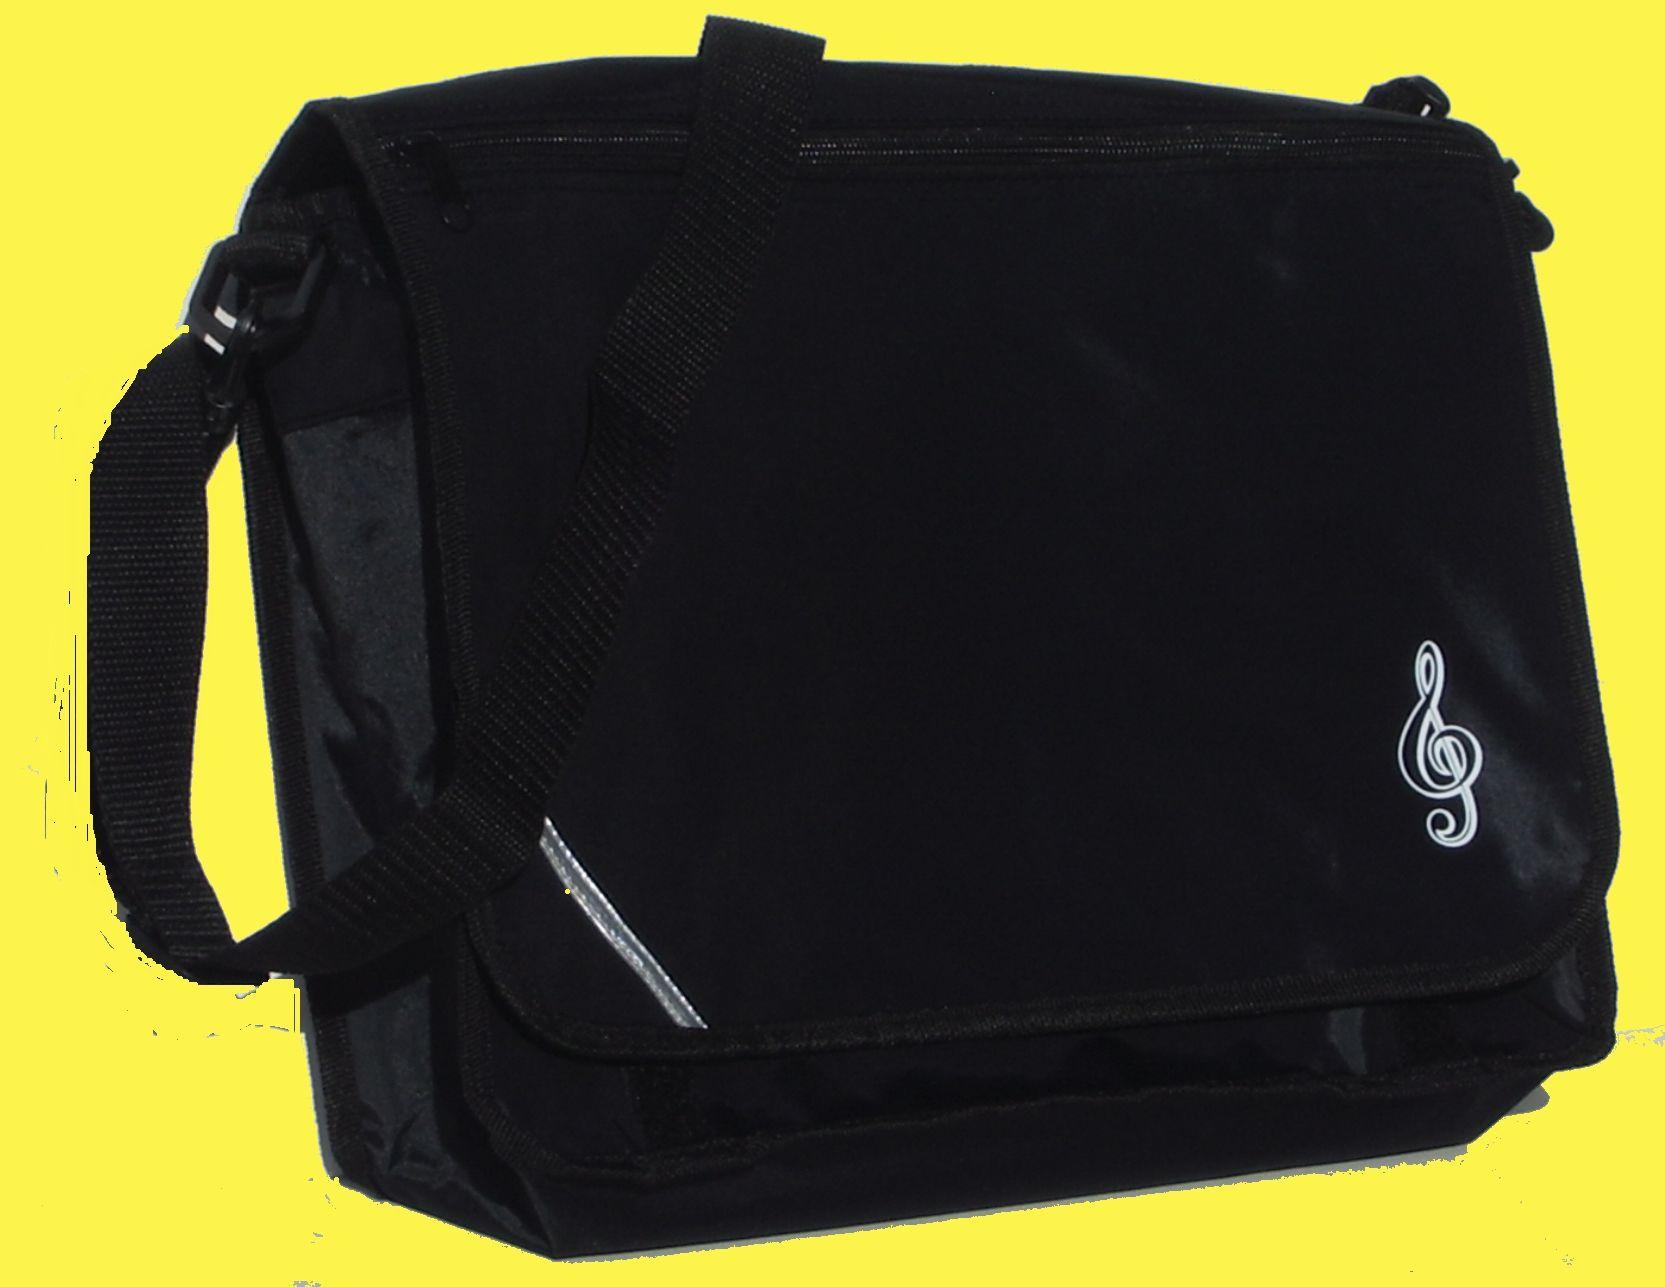 Music Book Bag | Book Bag | Pinterest | Bag, Books and Website